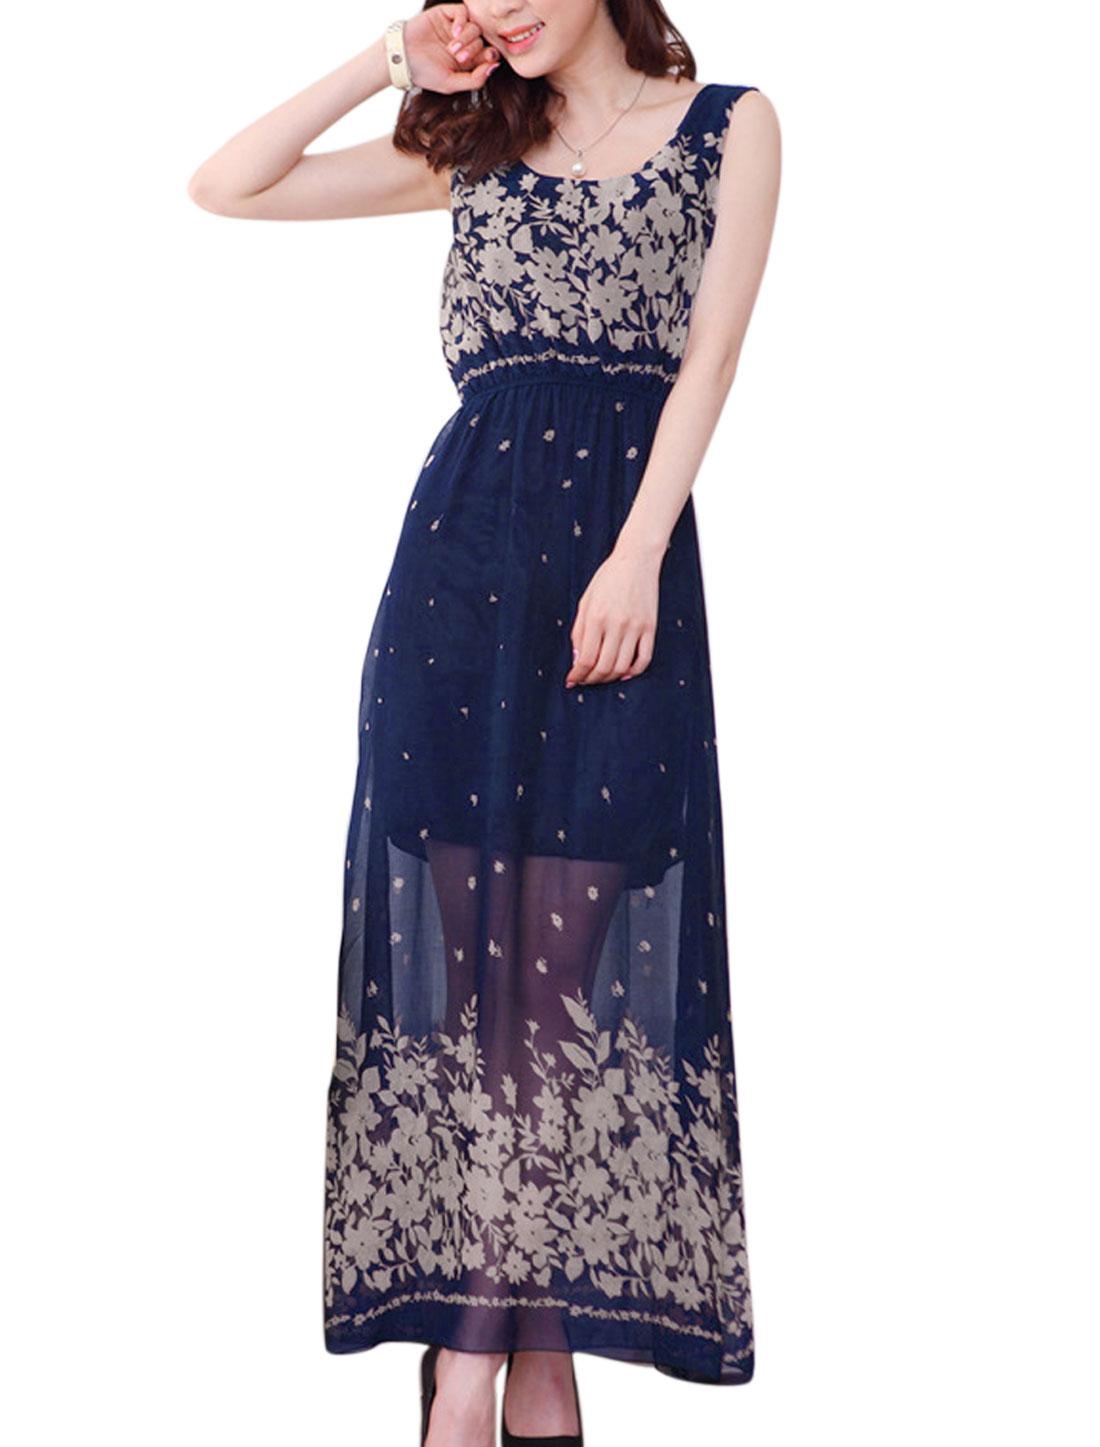 Lady Sleeveless Elastic Waist Floral Prints Chiffon Dress Dark Blue XS